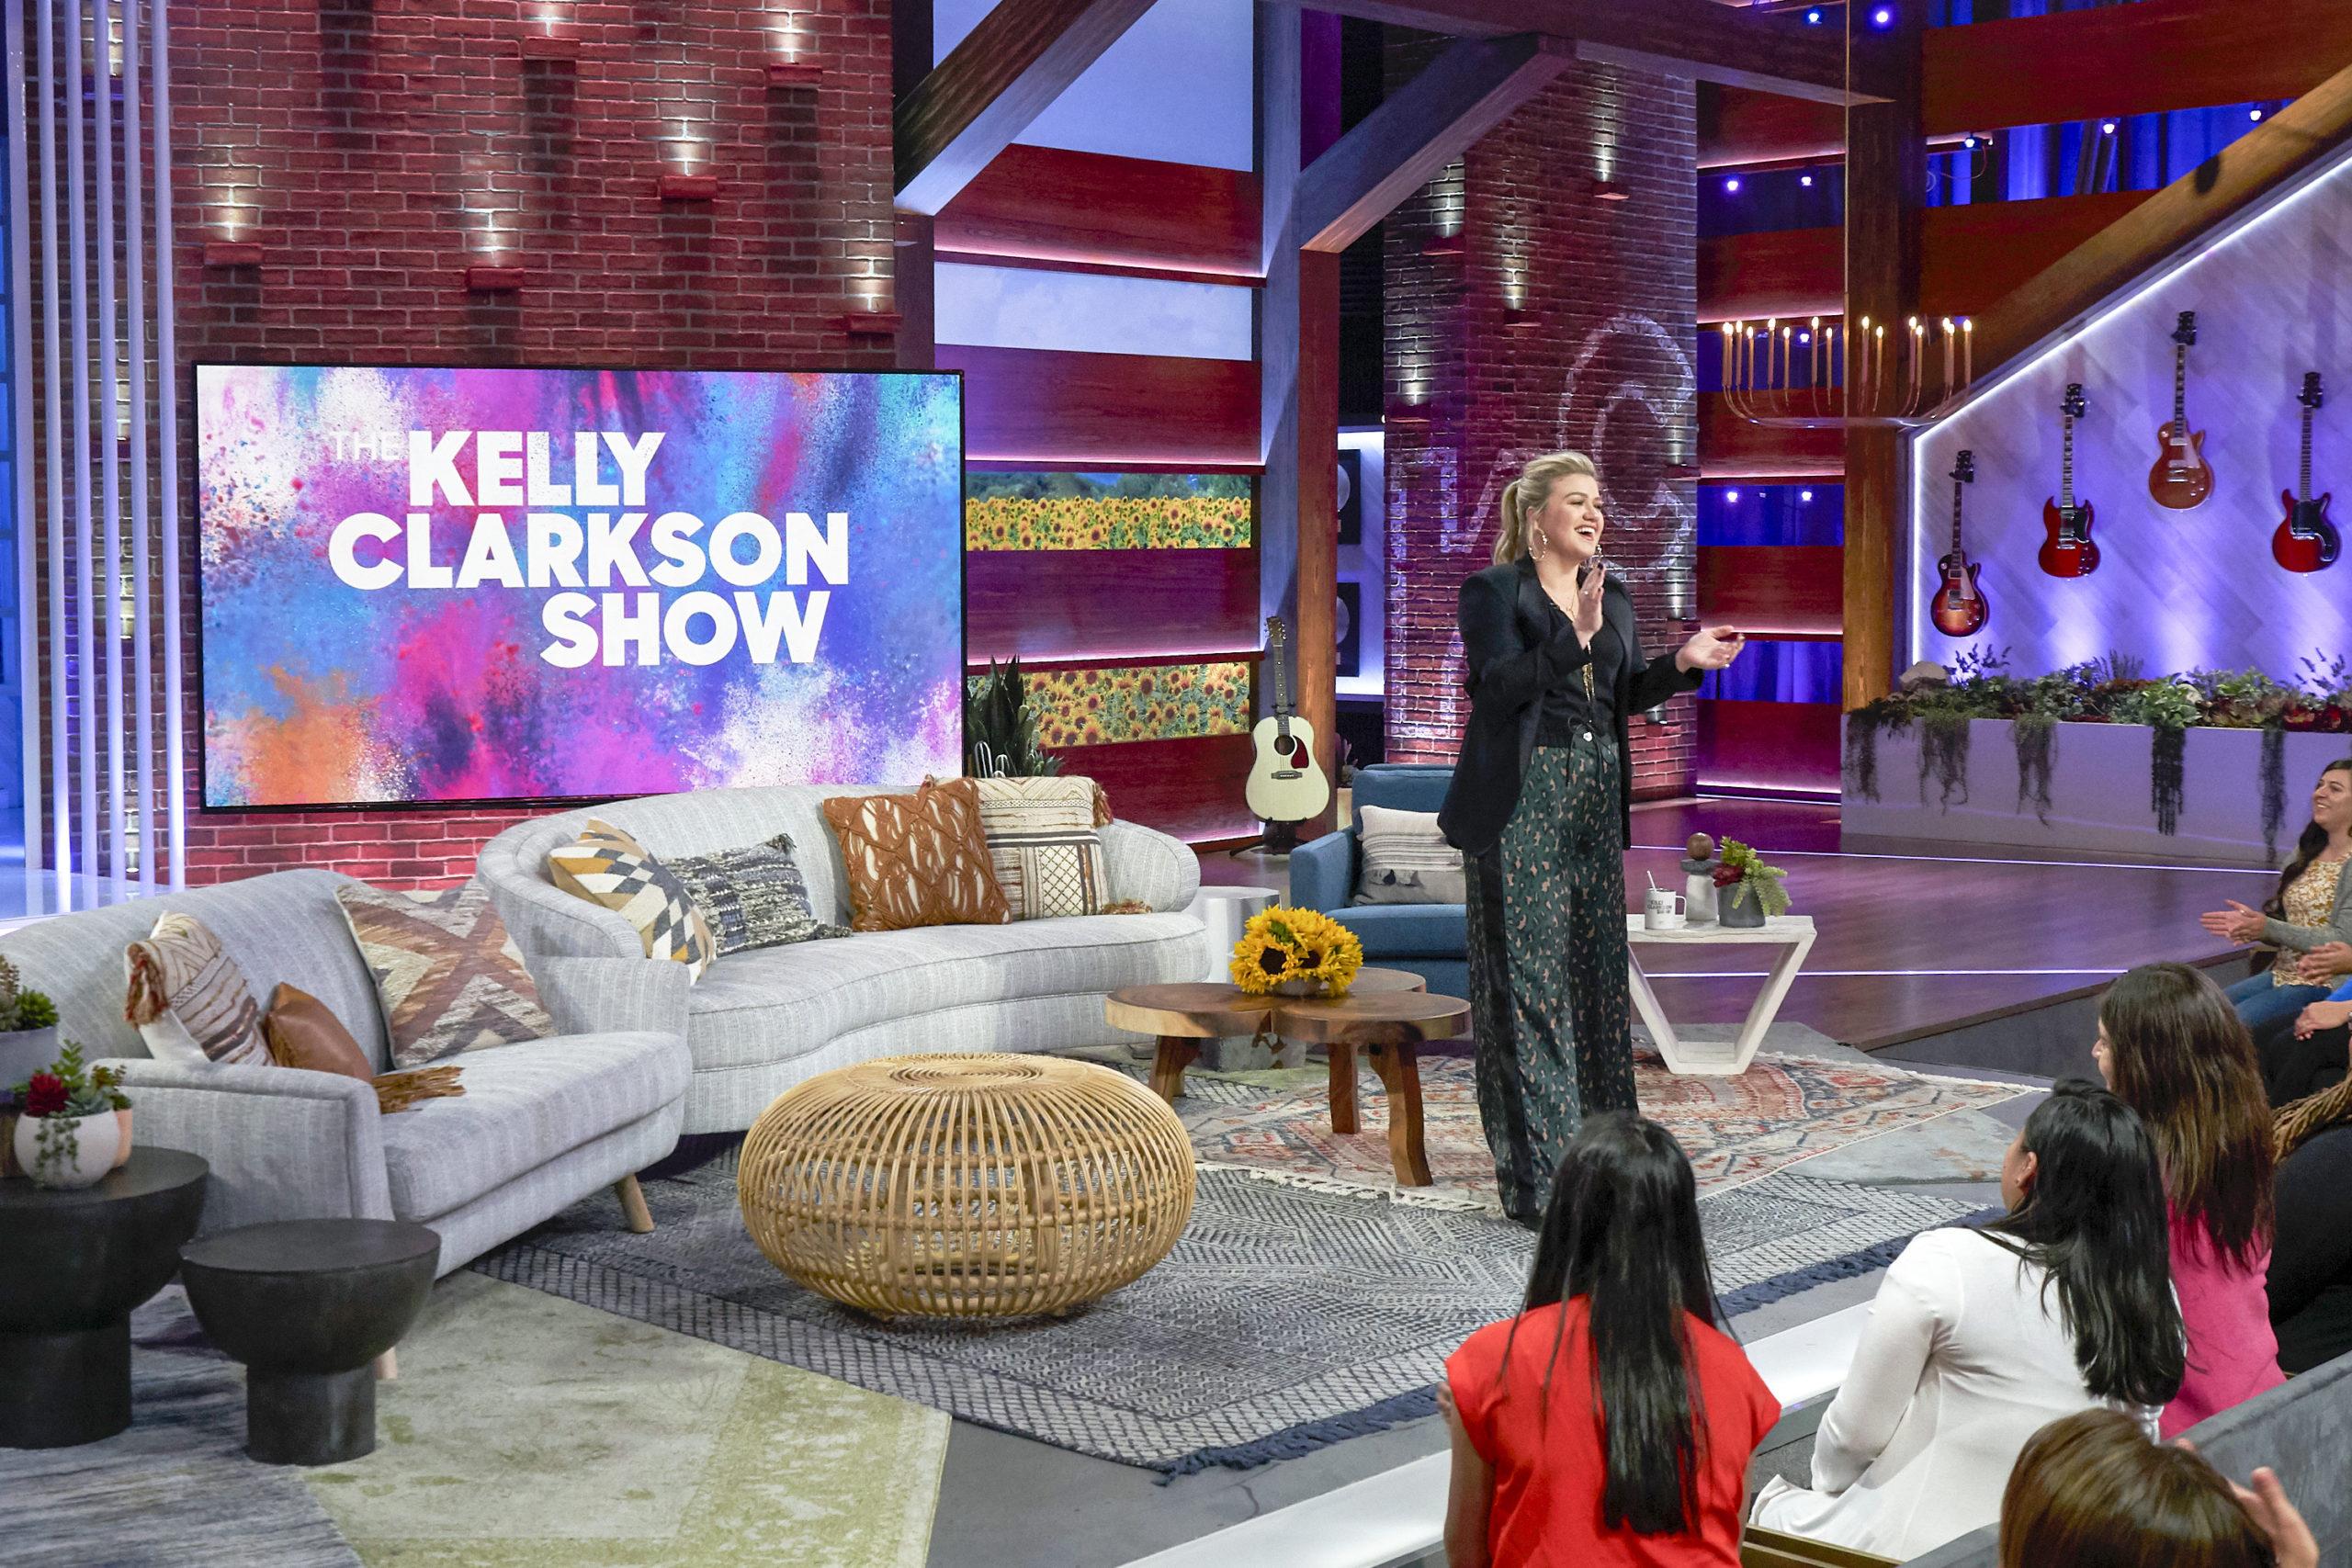 The Kelly Clarkson Show Season 3 Episode 12